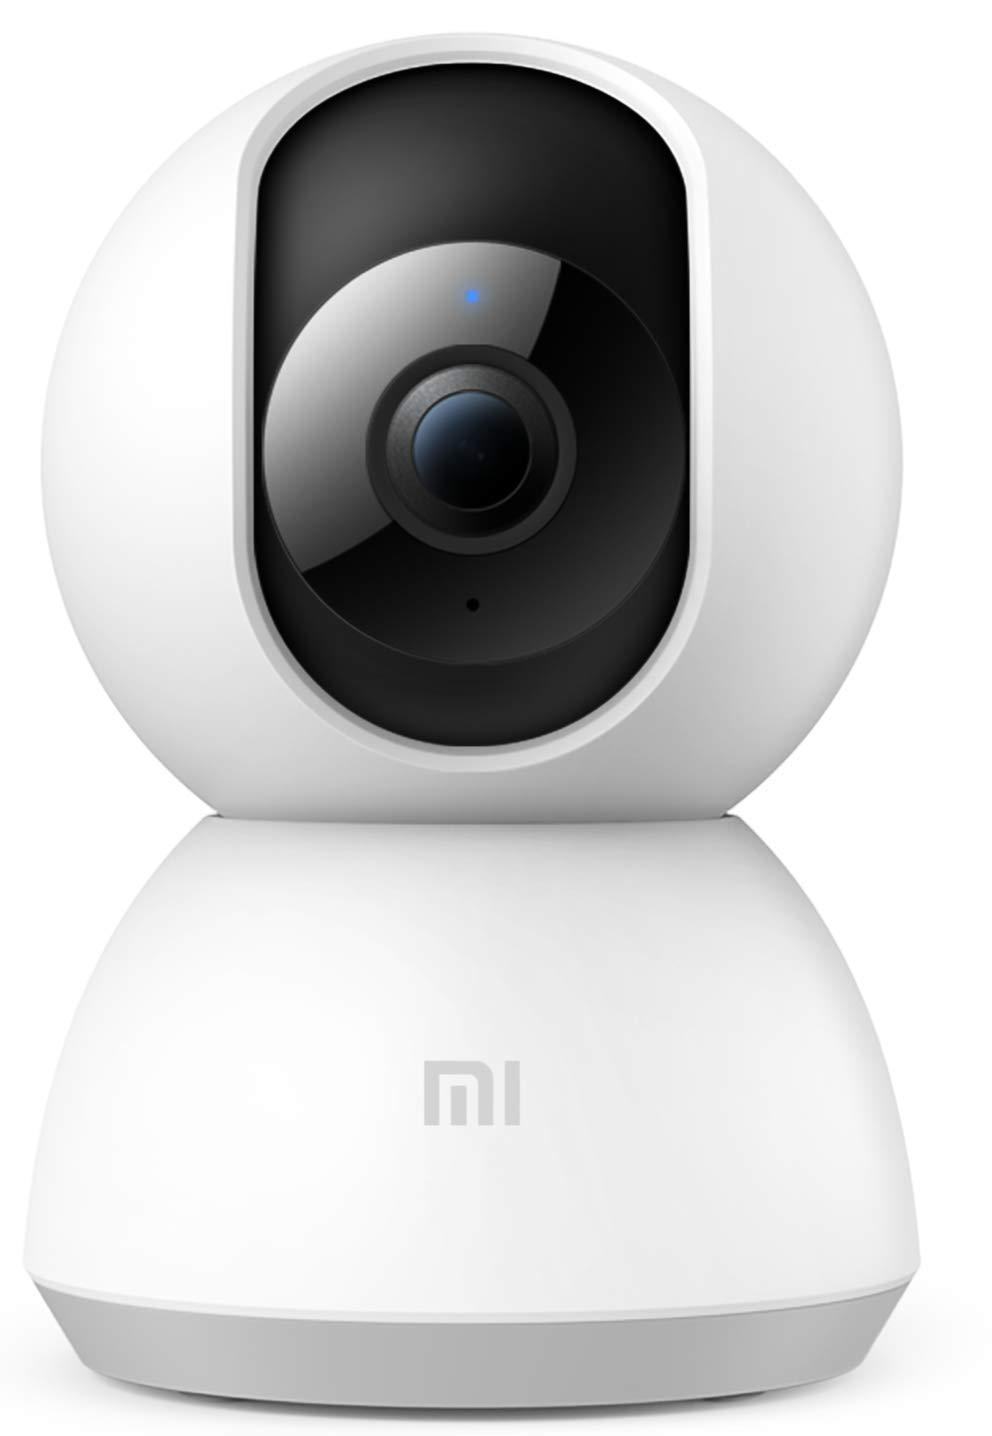 MI Smart home security camera system